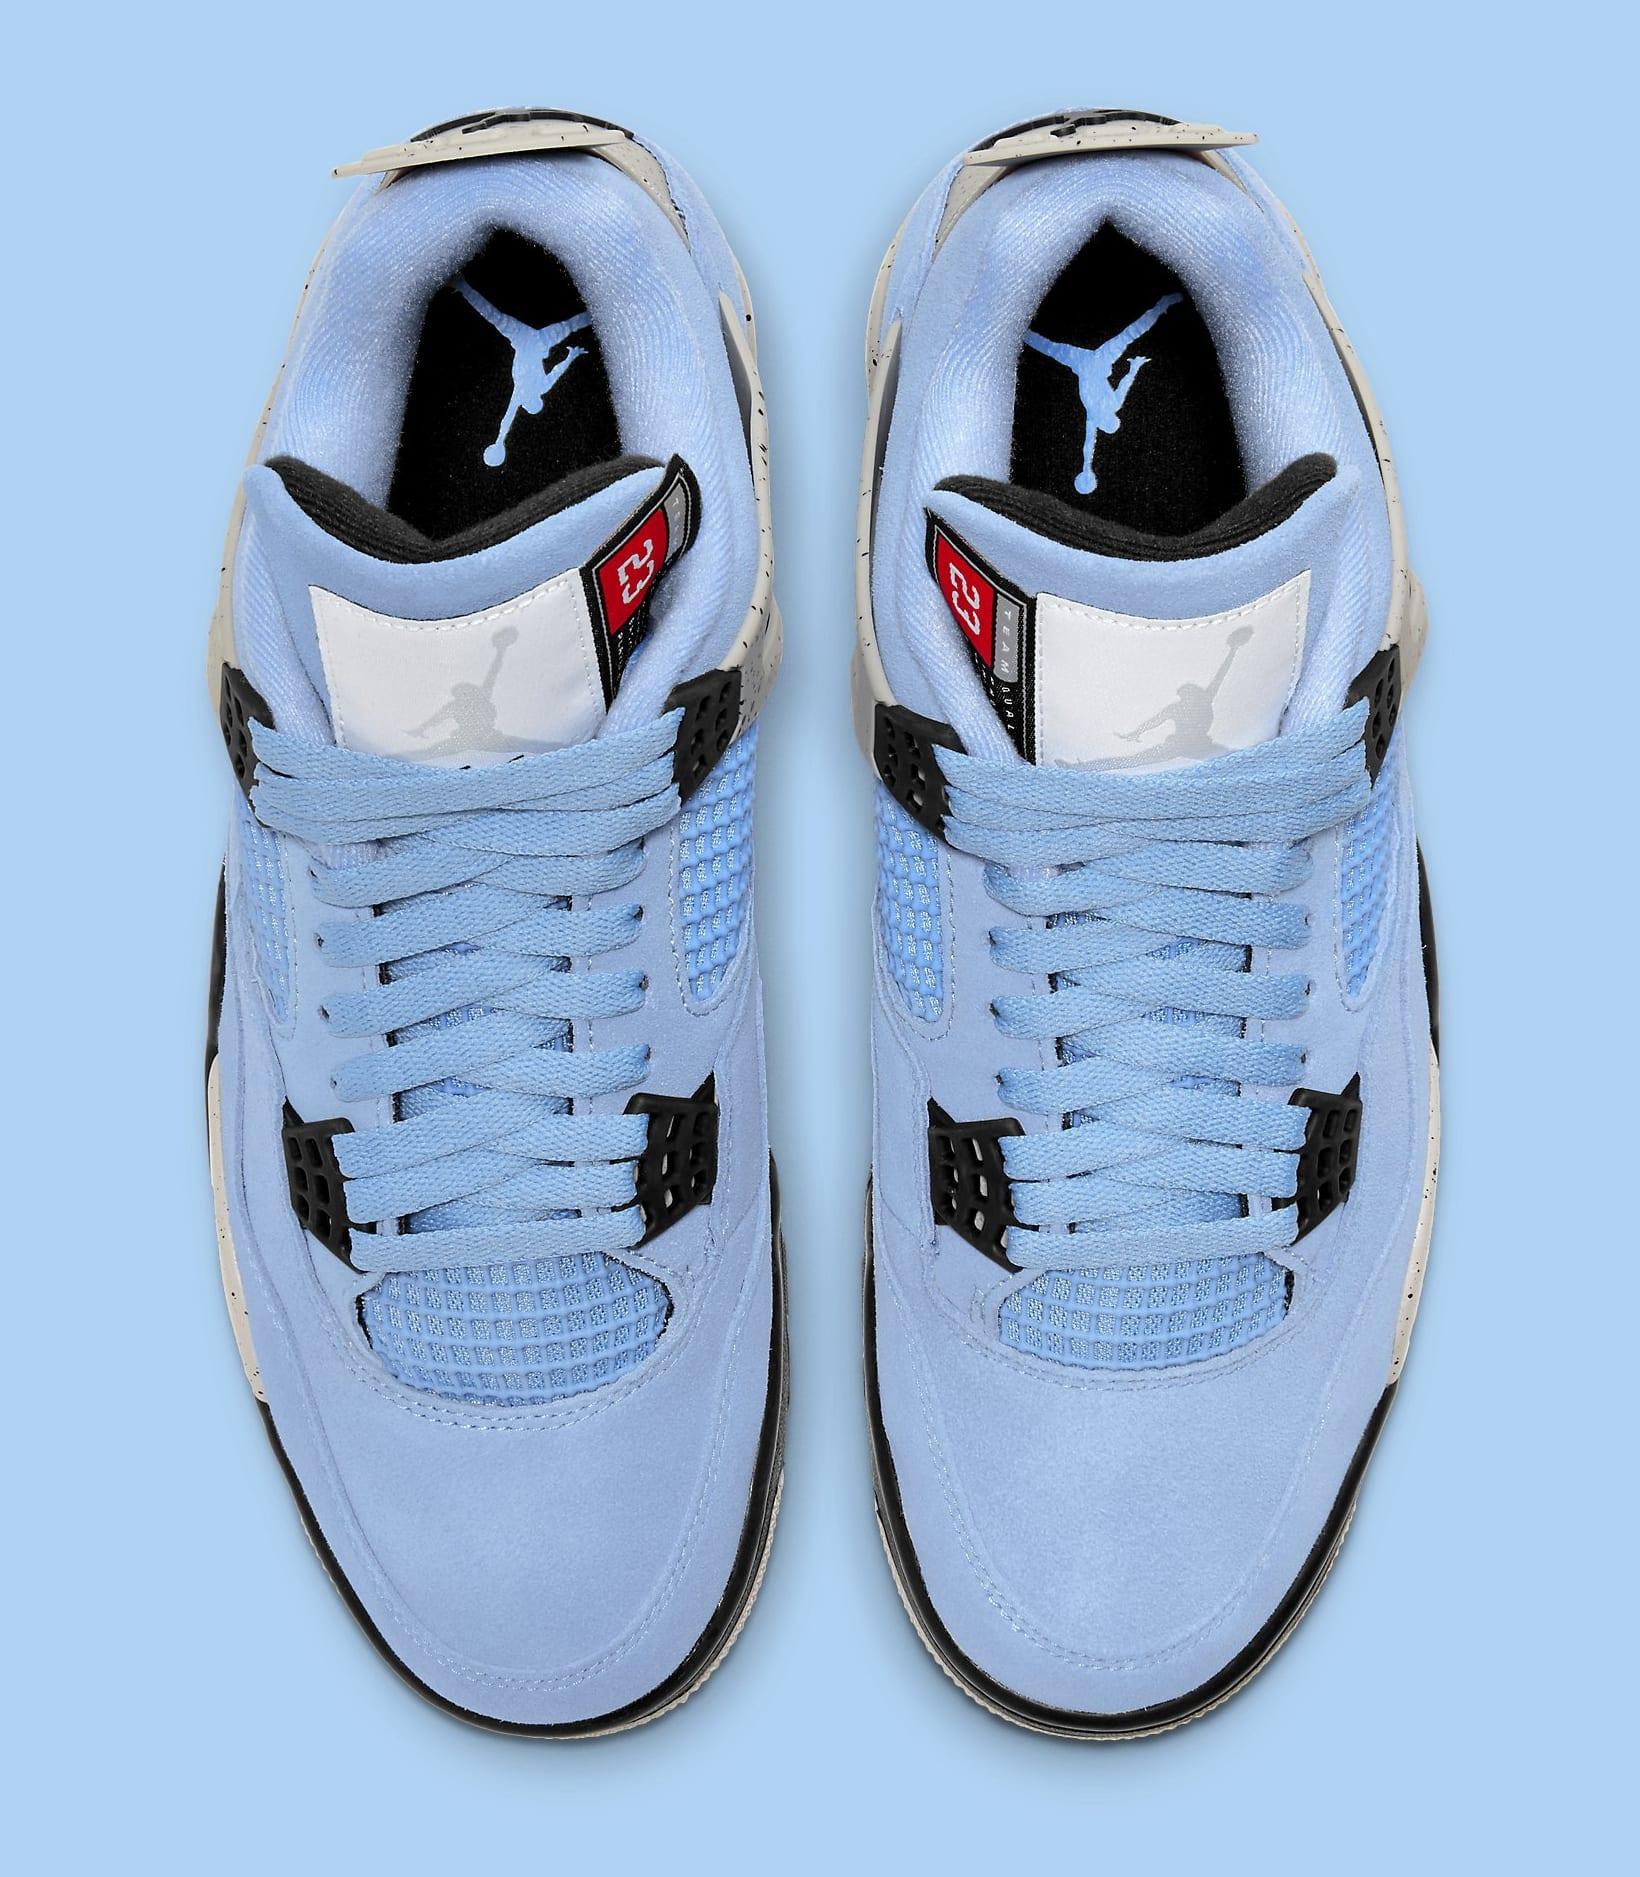 Air Jordan 4 Retro 'UNC' CT8527-400 Top